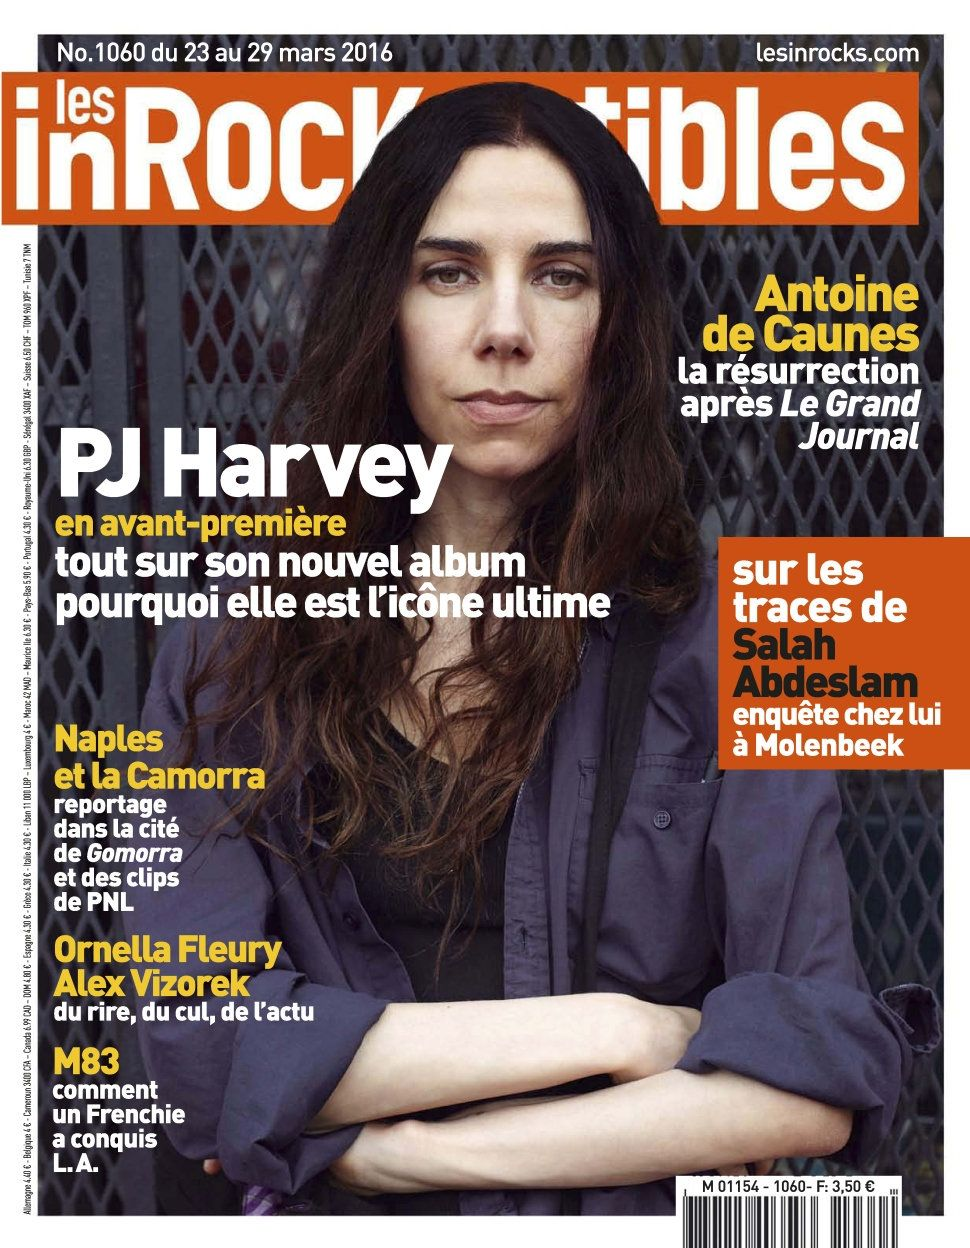 Les Inrockuptibles 1060 - 23 au 29 Mars 2016